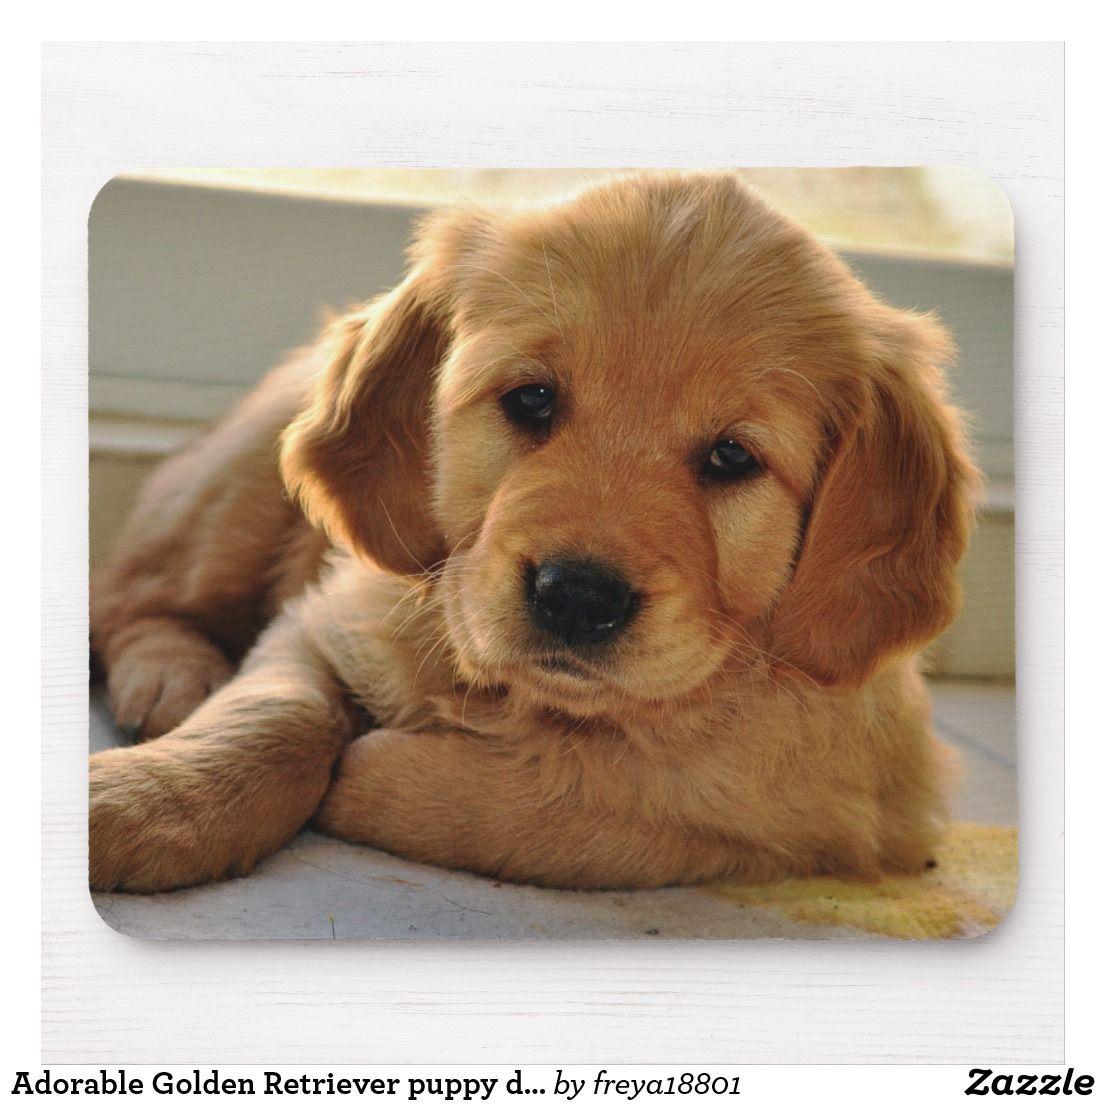 Adorable Golden Retriever Puppy Dog Mouse Pad Zazzle Com Dogs Golden Retriever Golden Retriever Golden Retriever Puppy